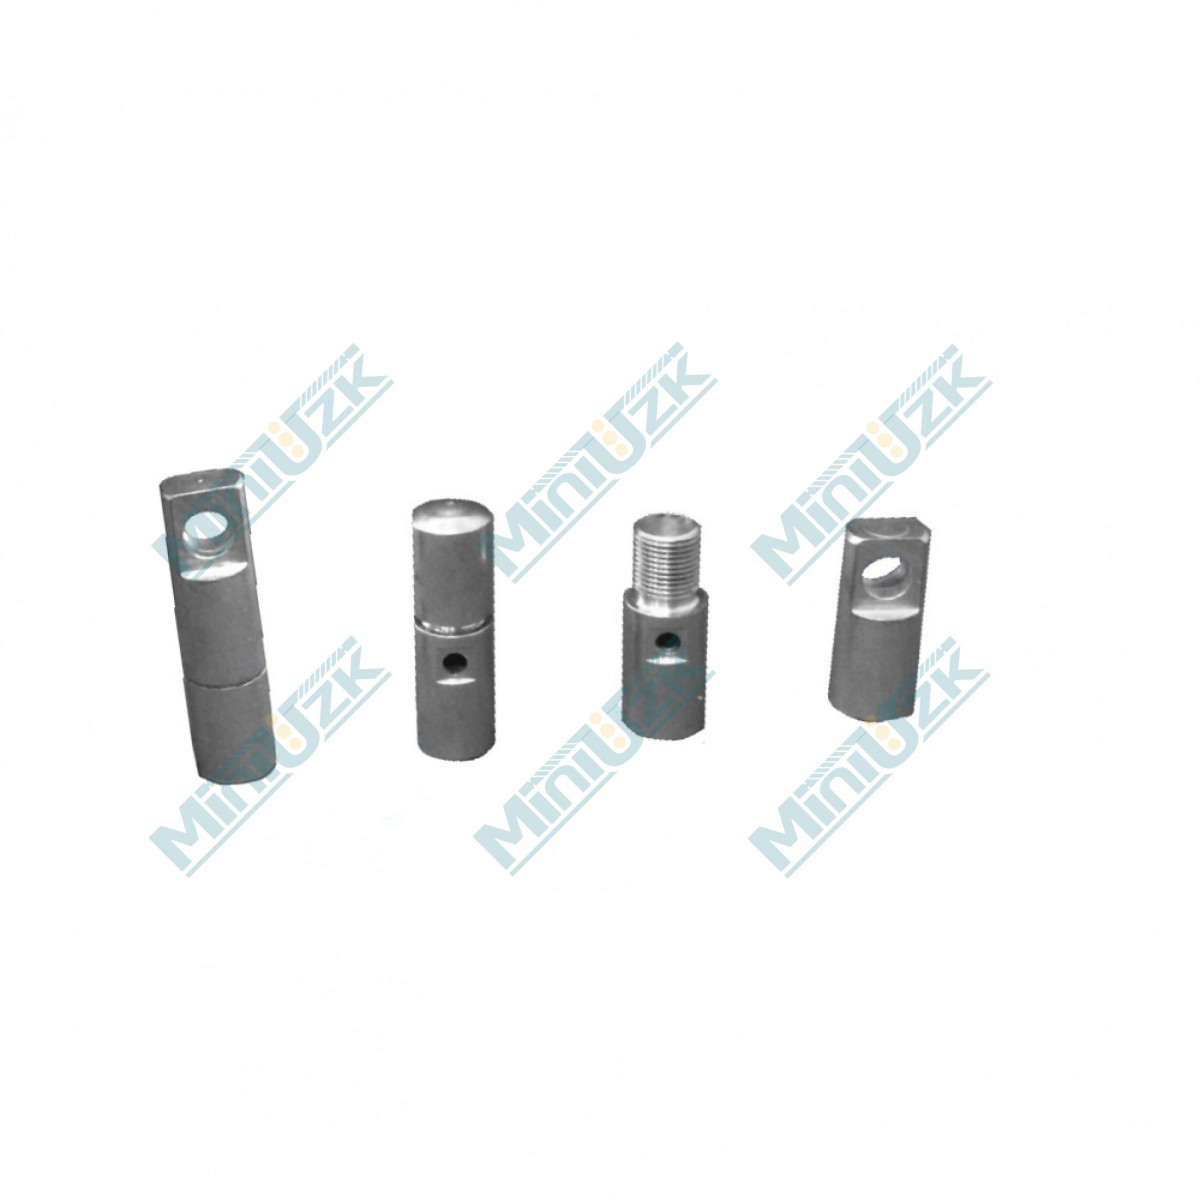 Устройство закладки кабеля (УЗК) OlmiOn СП-Т1-11/250